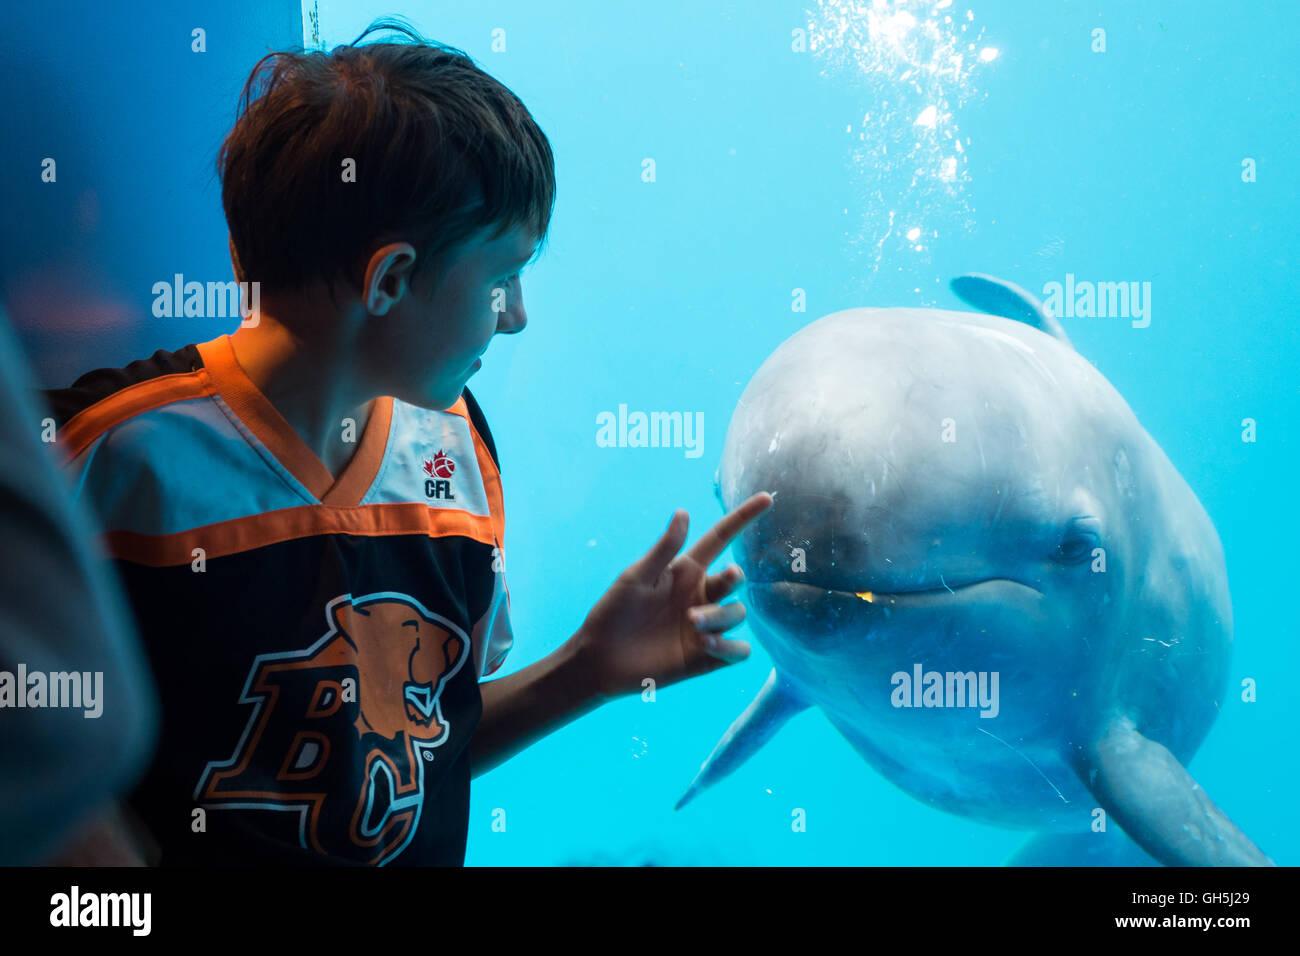 L'enfant interagit avec une fausse orque (Pseudorca crassidens) à l'Aquarium de Vancouver à Vancouver, Canada. Banque D'Images